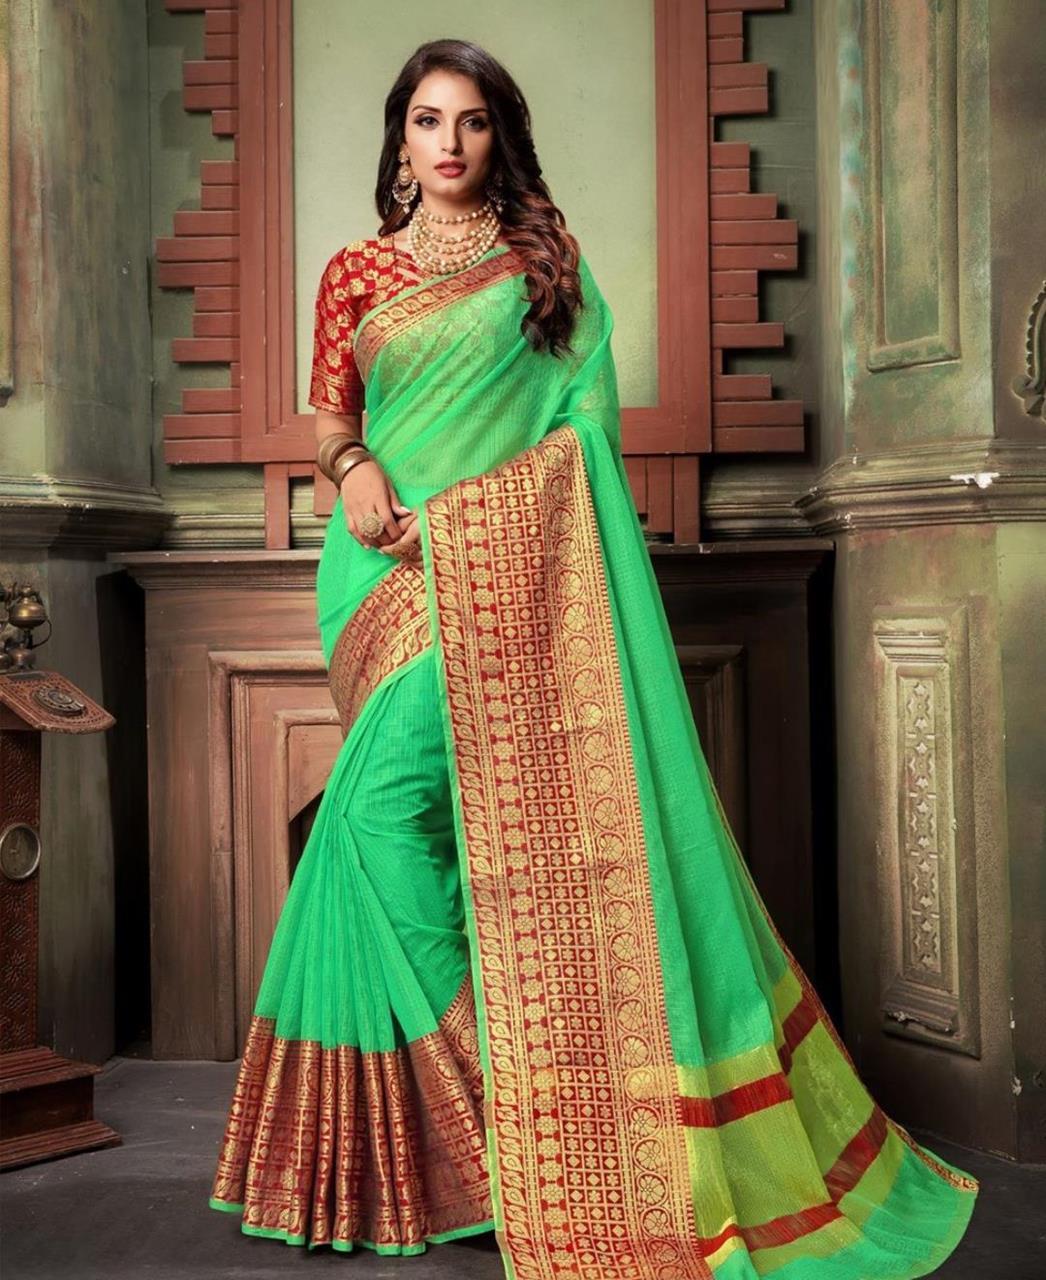 Woven Cotton Saree (Sari) in Green